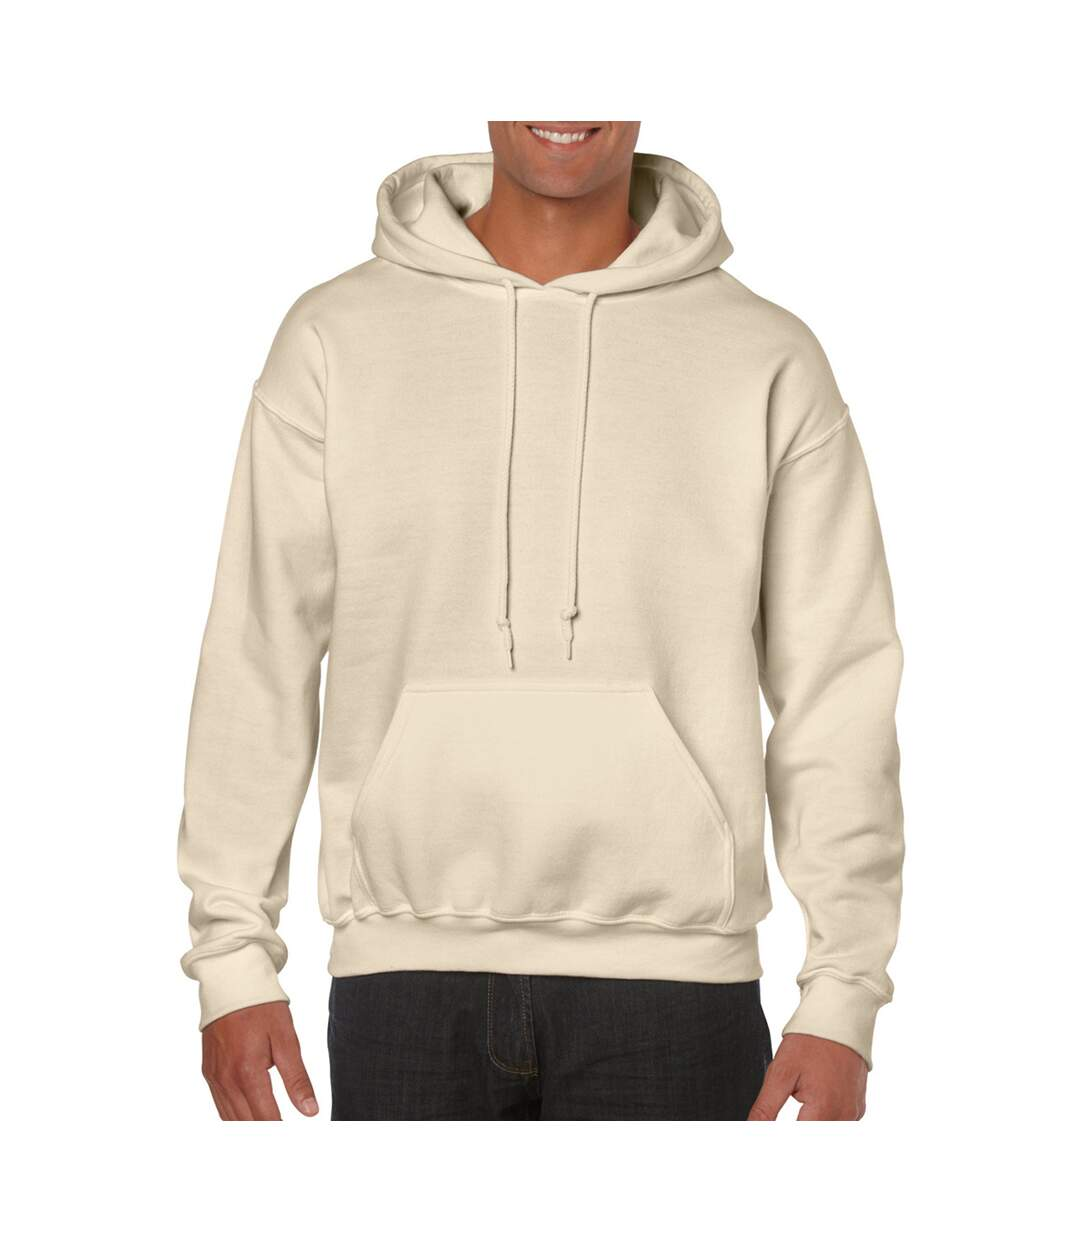 Gildan Heavy Blend Adult Unisex Hooded Sweatshirt / Hoodie (Graphite Heather) - UTBC468